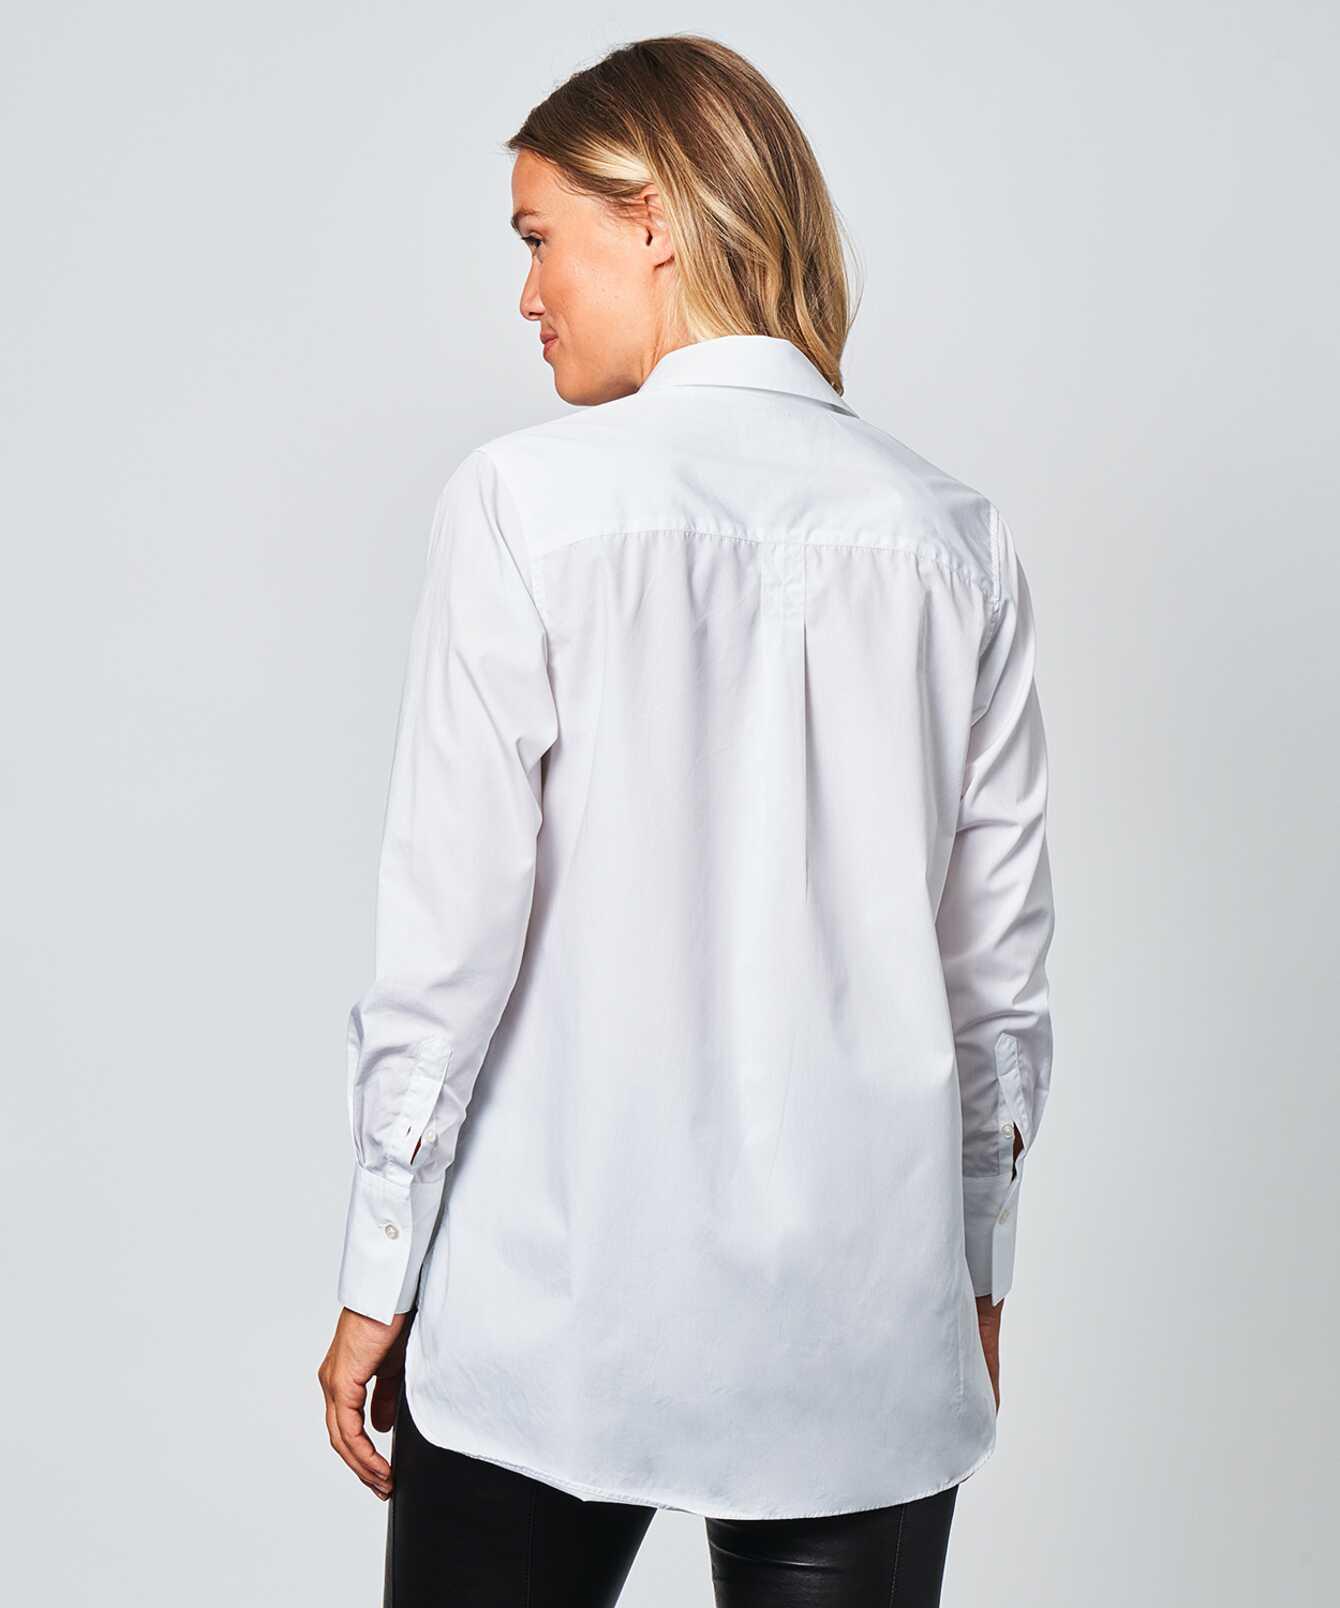 Shirt Nova White  The Shirt Factory